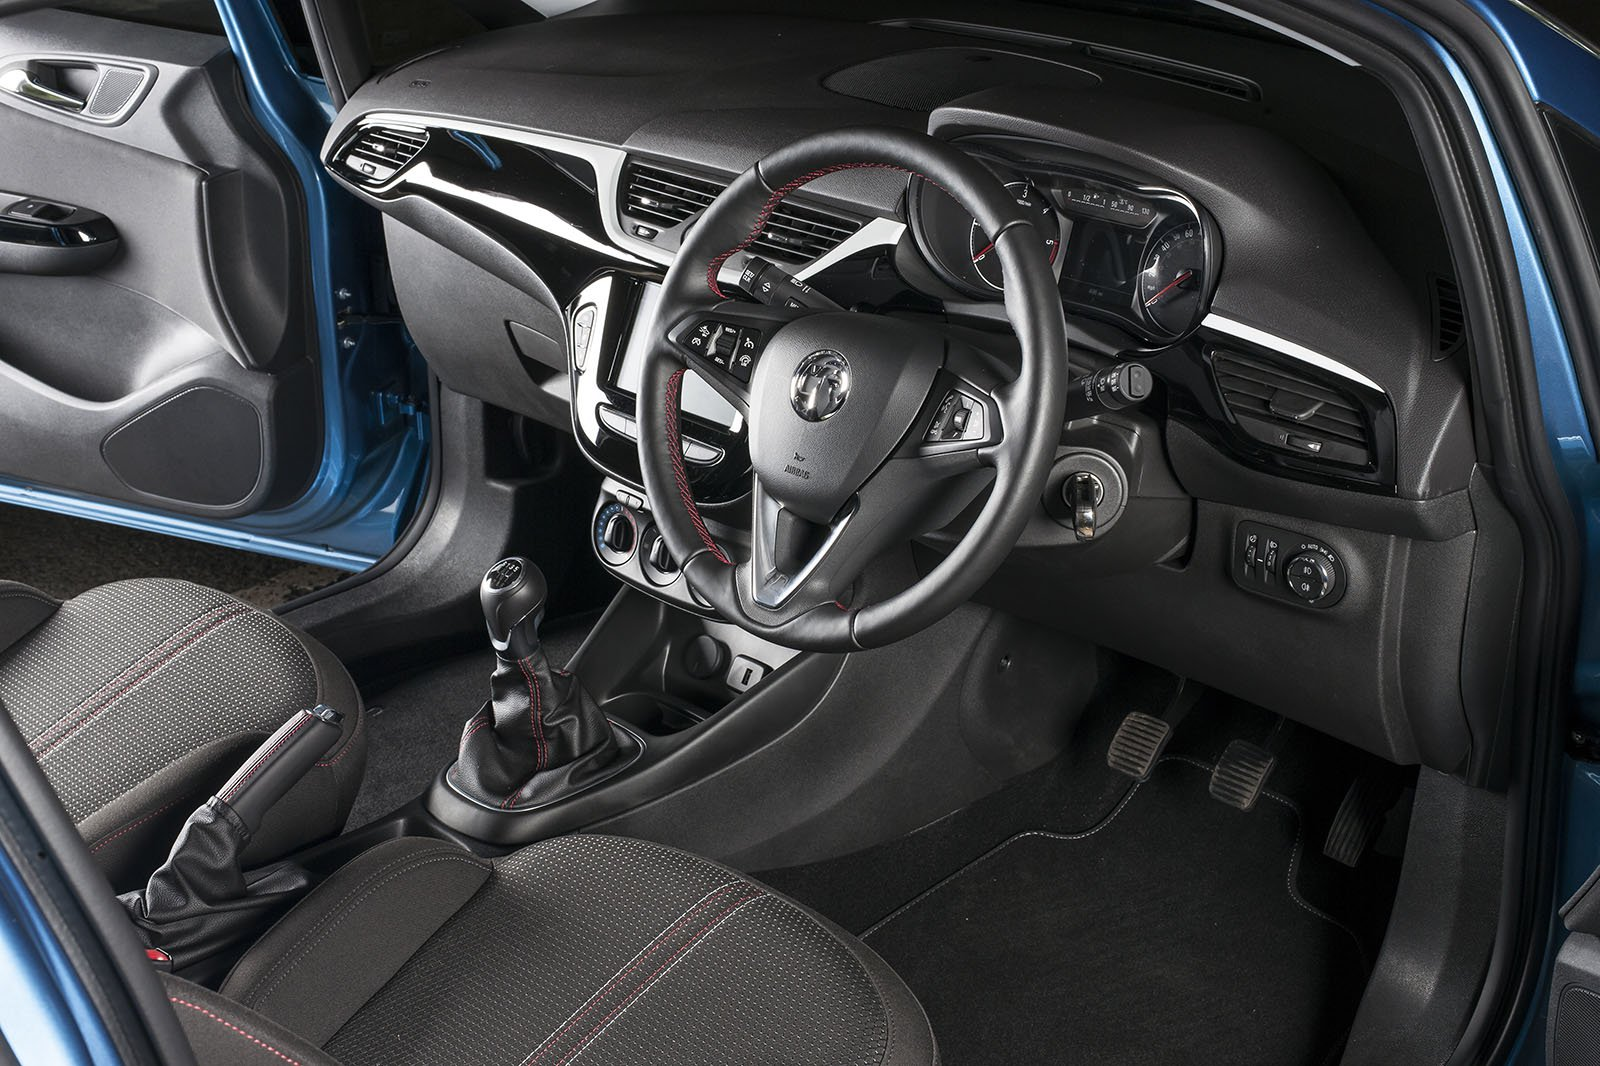 Vauxhall Corsavan dash